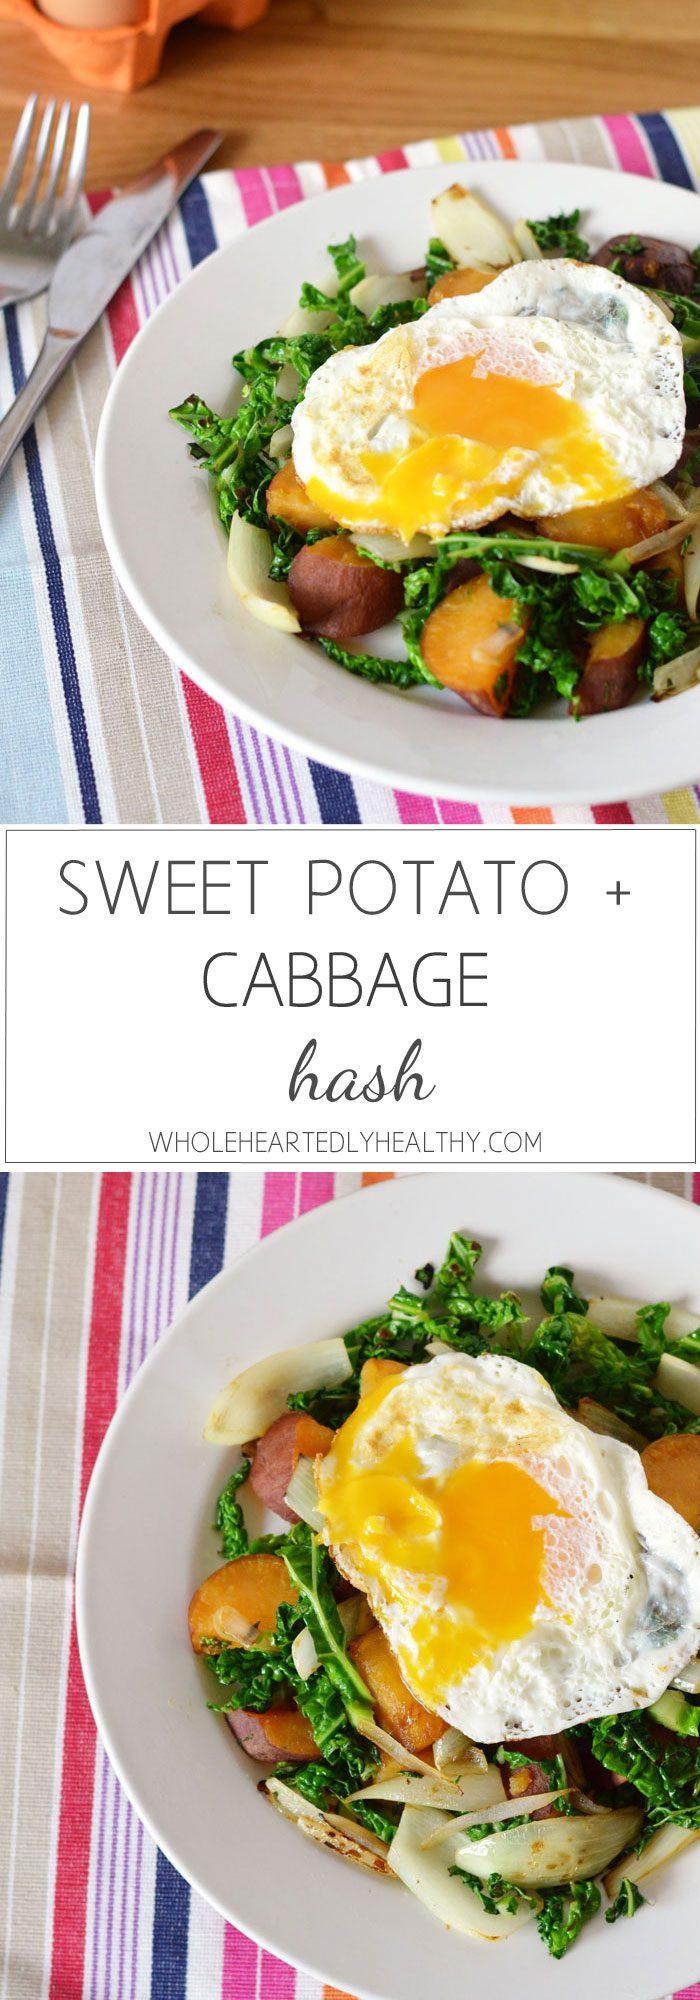 Sweet potato and cabbage hash recipe